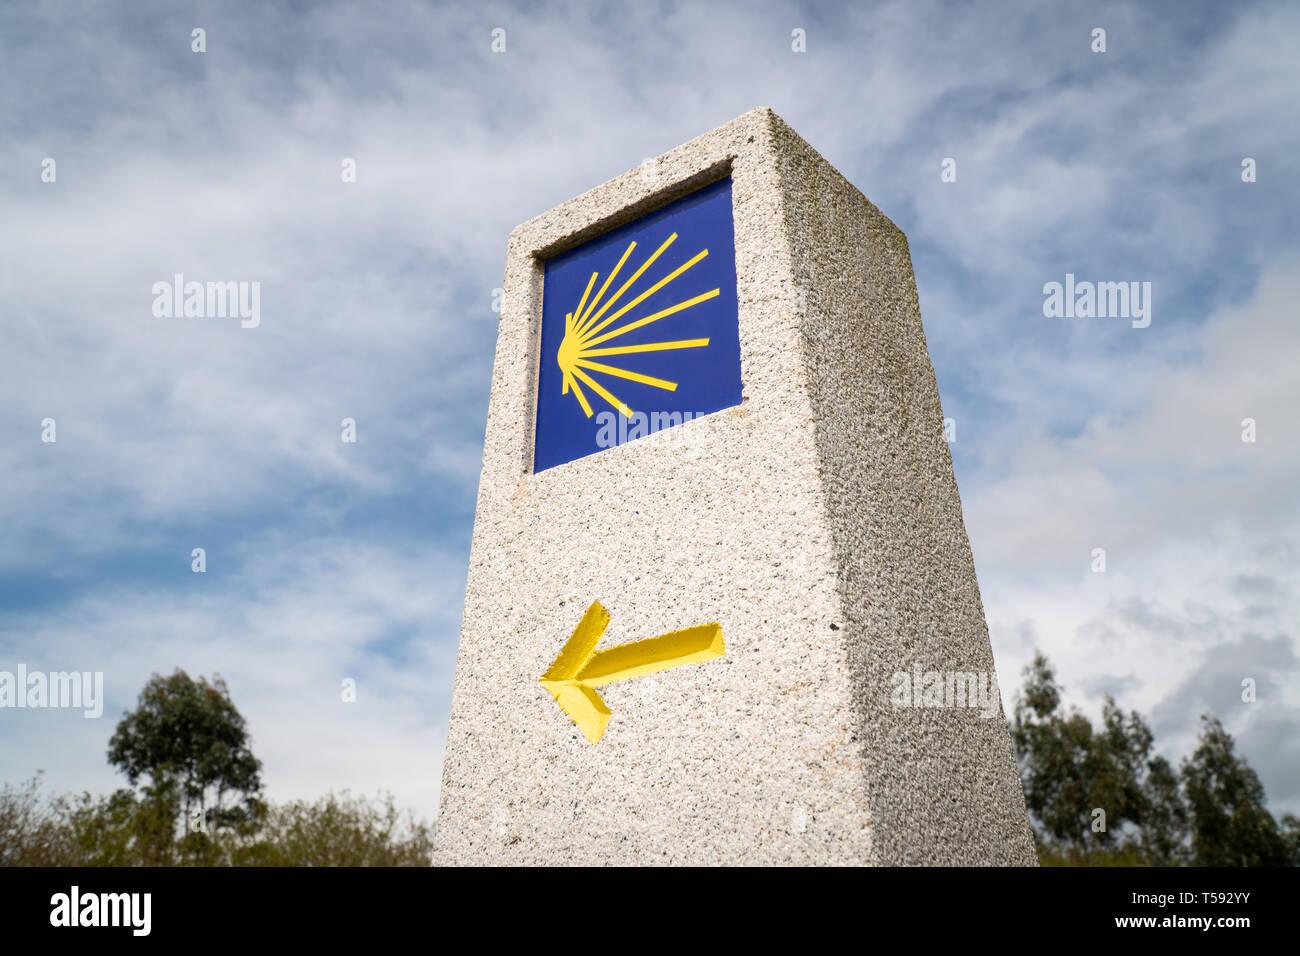 Camino de Santiago milestone. Pilgrimage sign to Santiago de Compostela Stock Photo